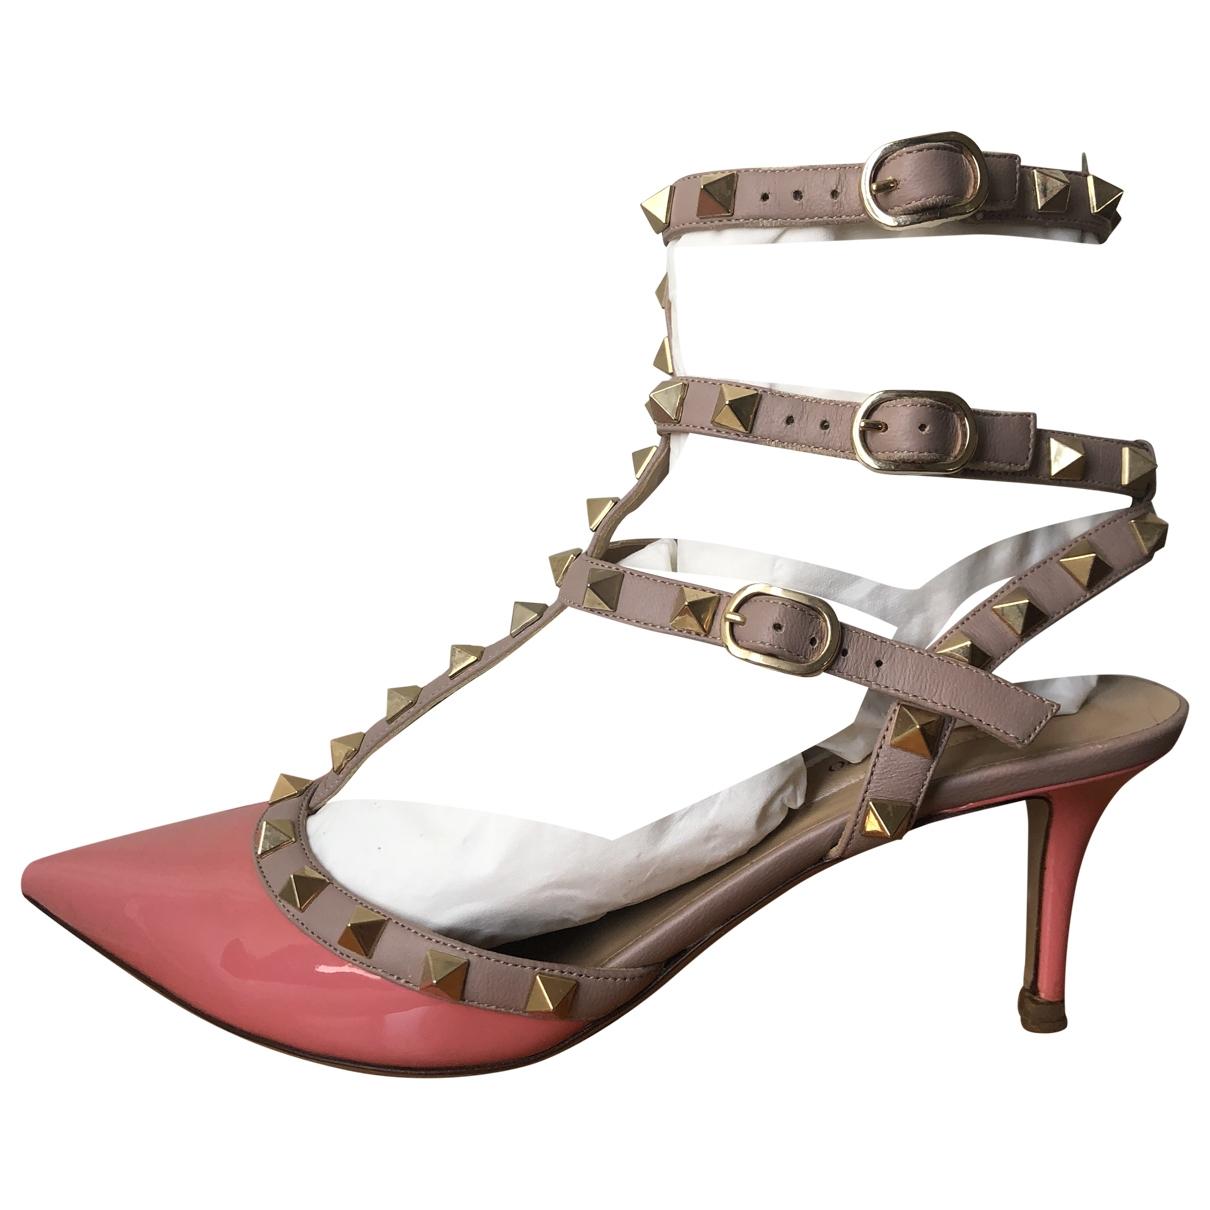 Valentino Garavani Rockstud Pink Patent leather Heels for Women 38 EU